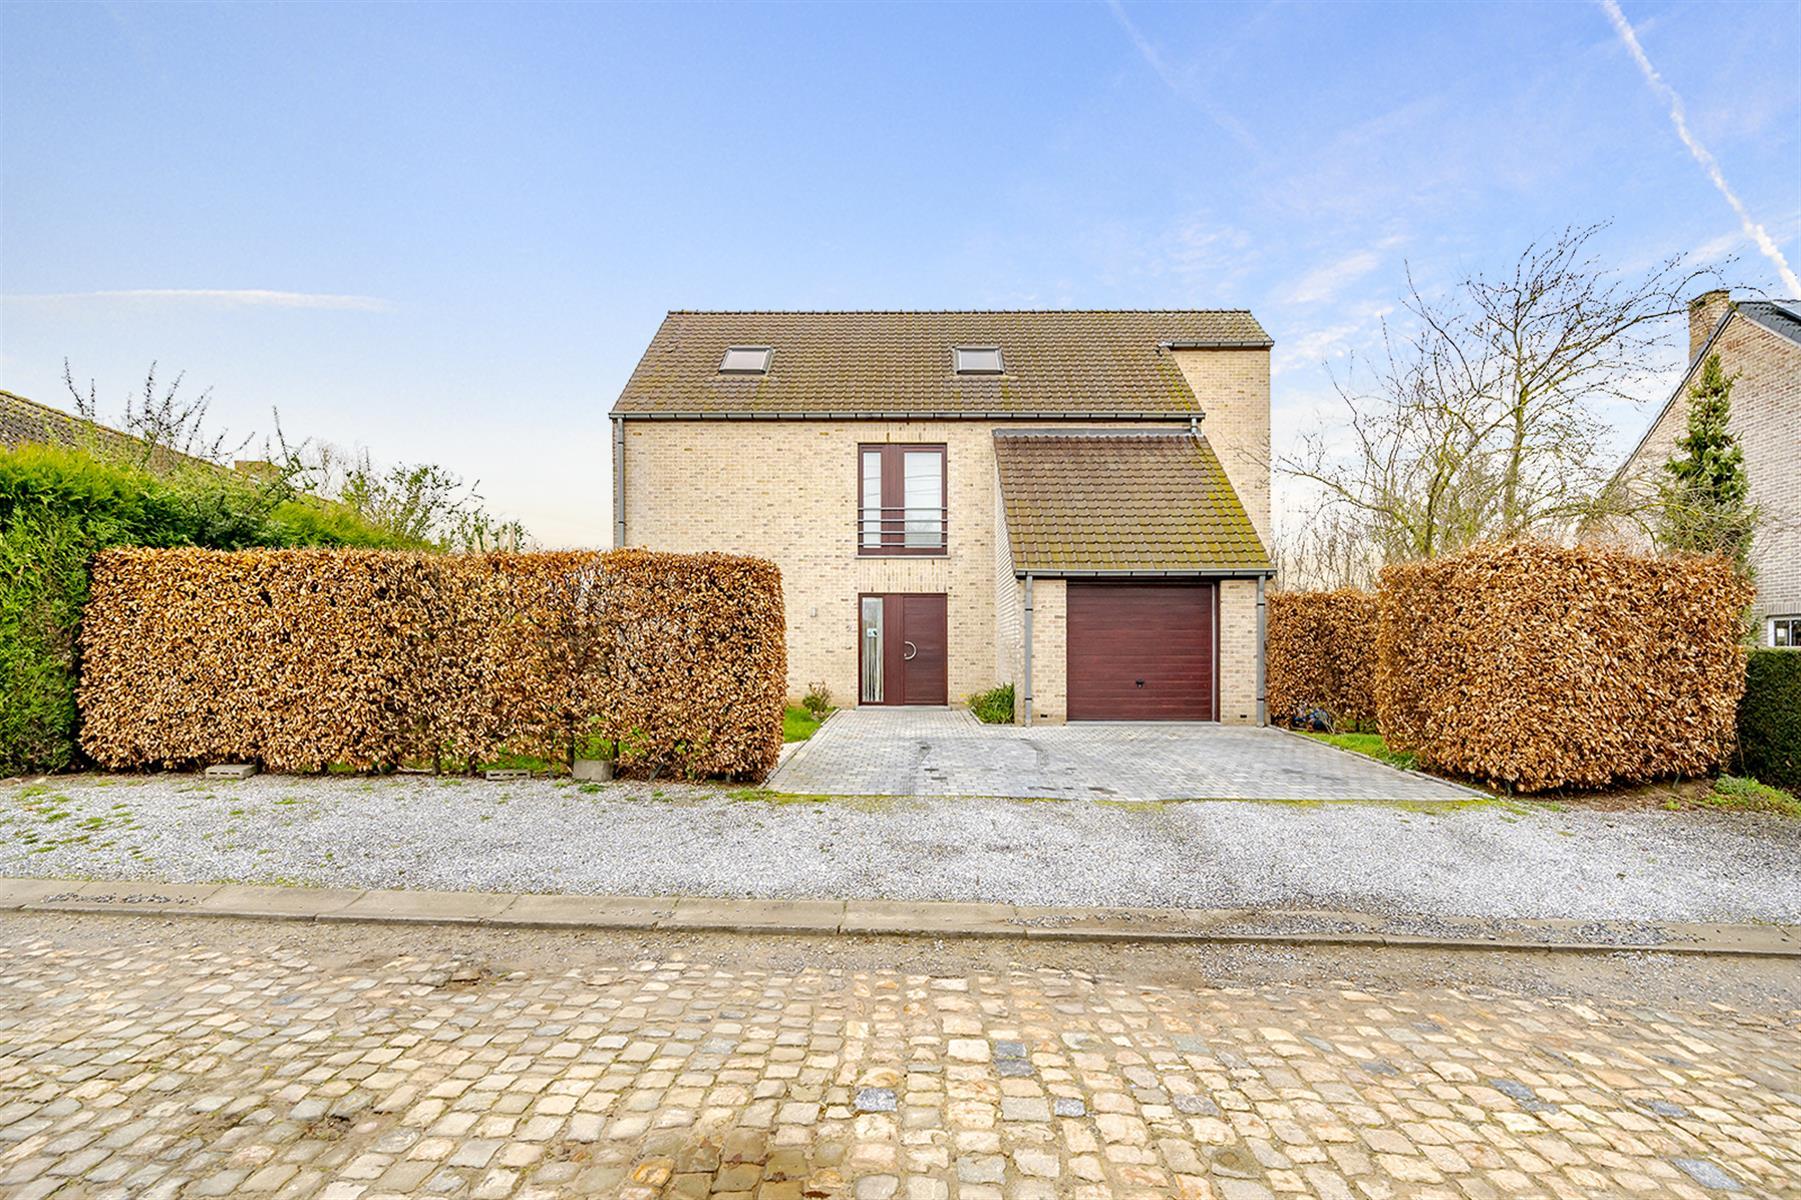 Maison - Orp-Jauche - #4014627-2